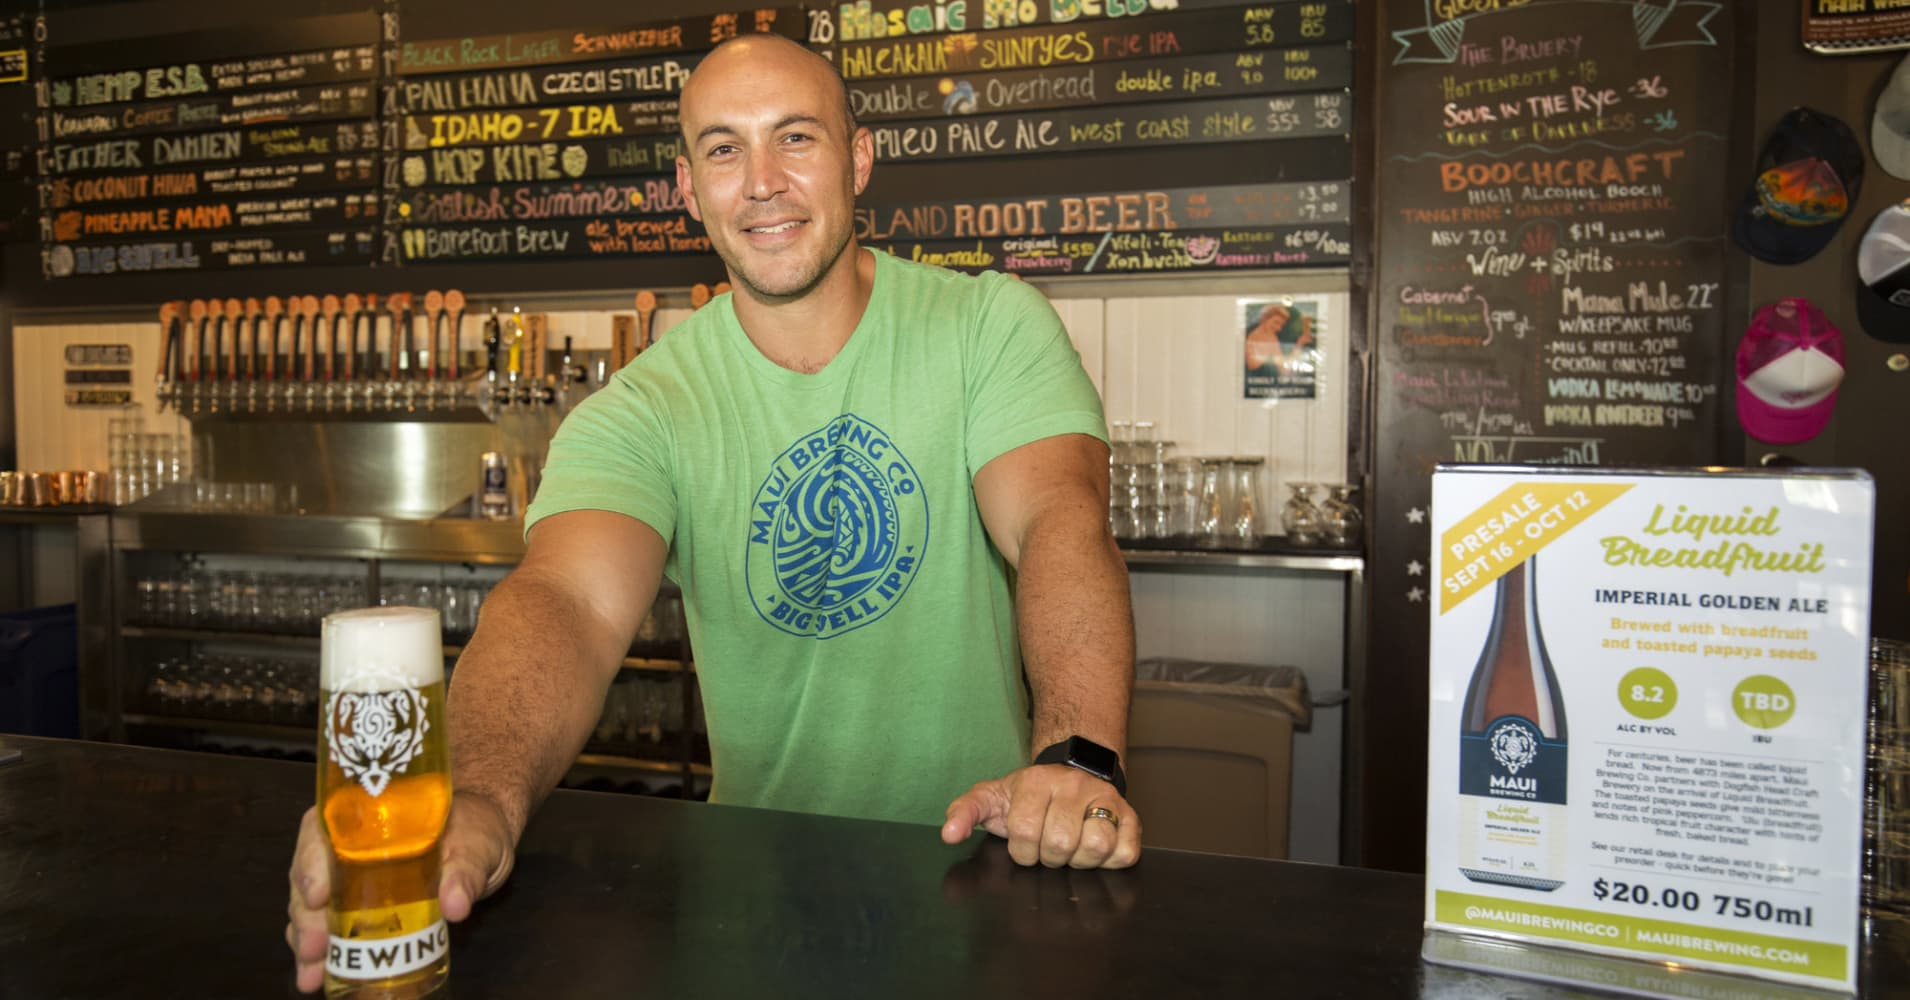 Garrett Marrero, co-founder of Maui Brewing Company